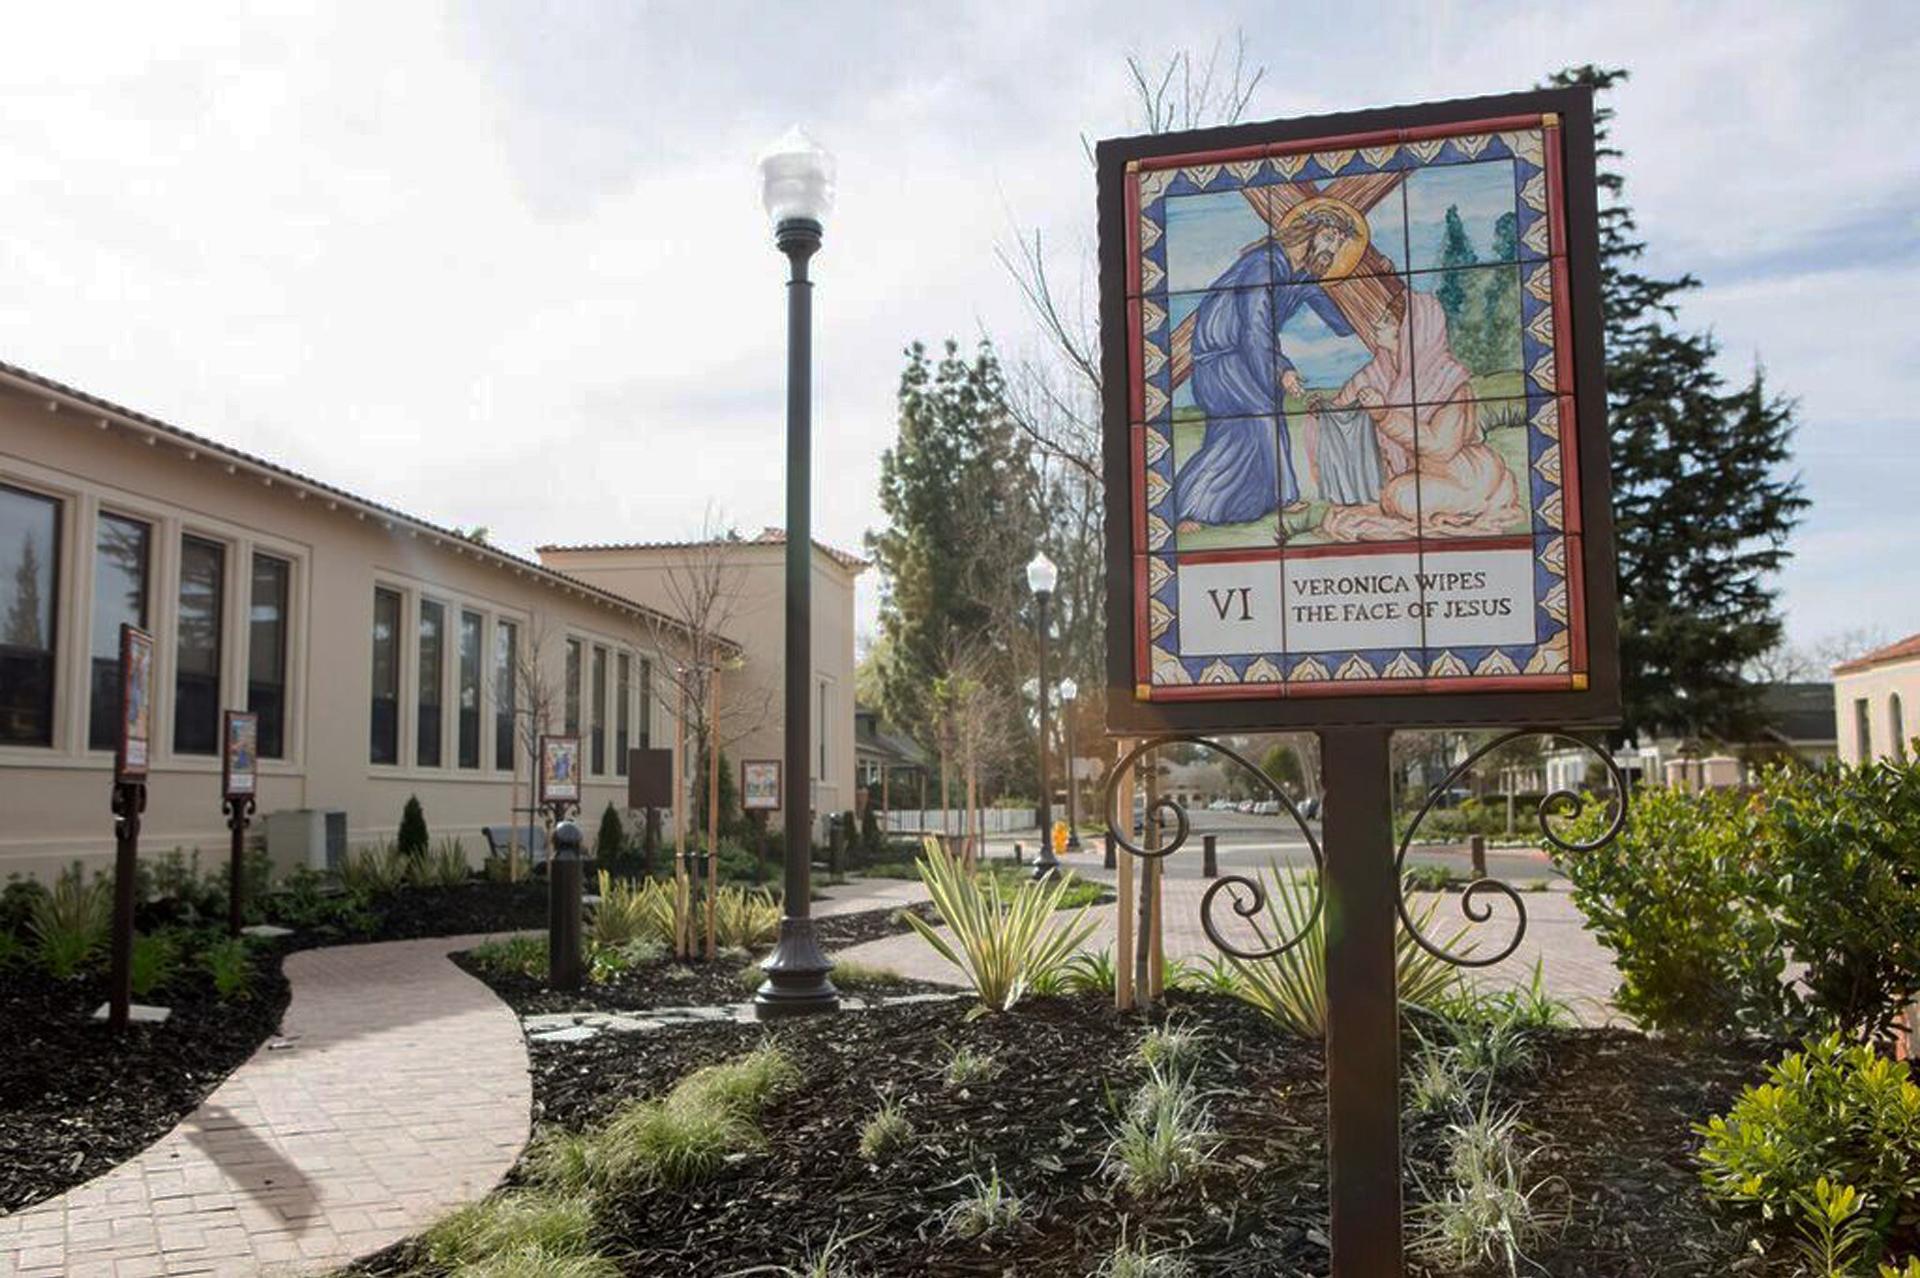 St. Anne's Plaza